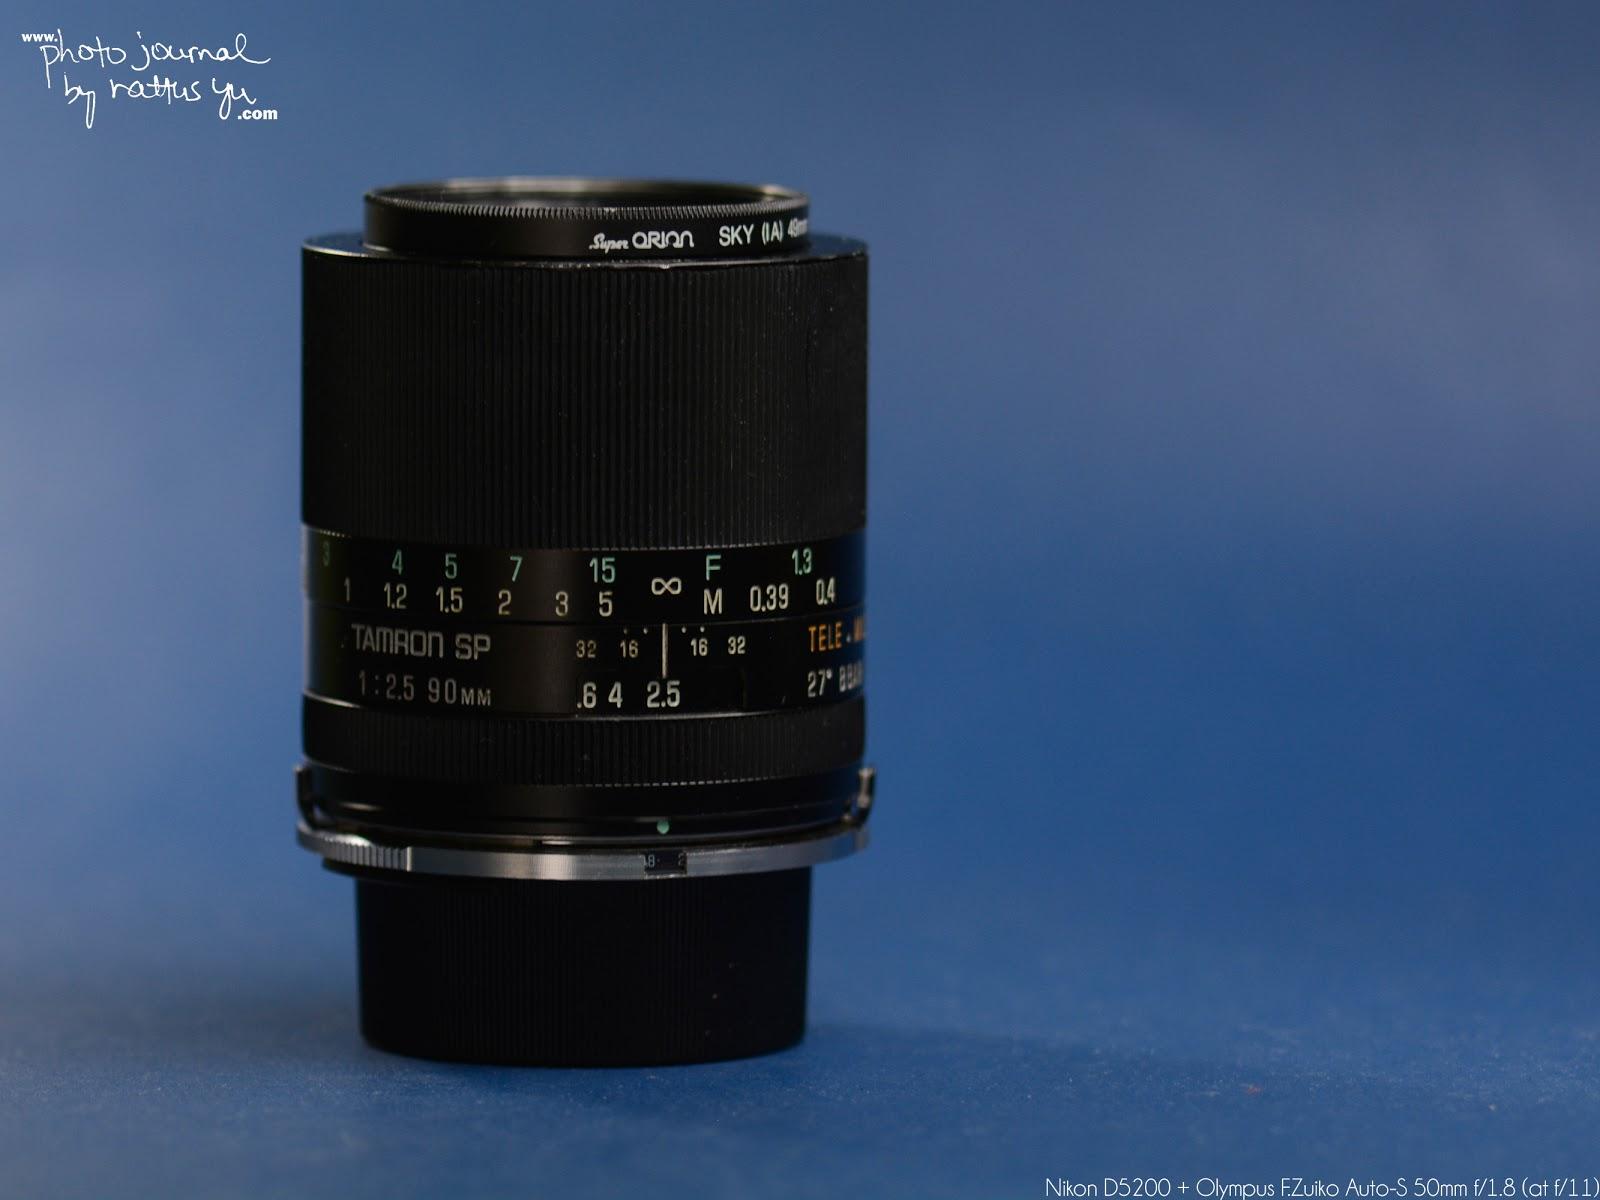 Olympus F.Zuiko Auto-S 50mm f/1.8... Converting OM To Nikon Mount